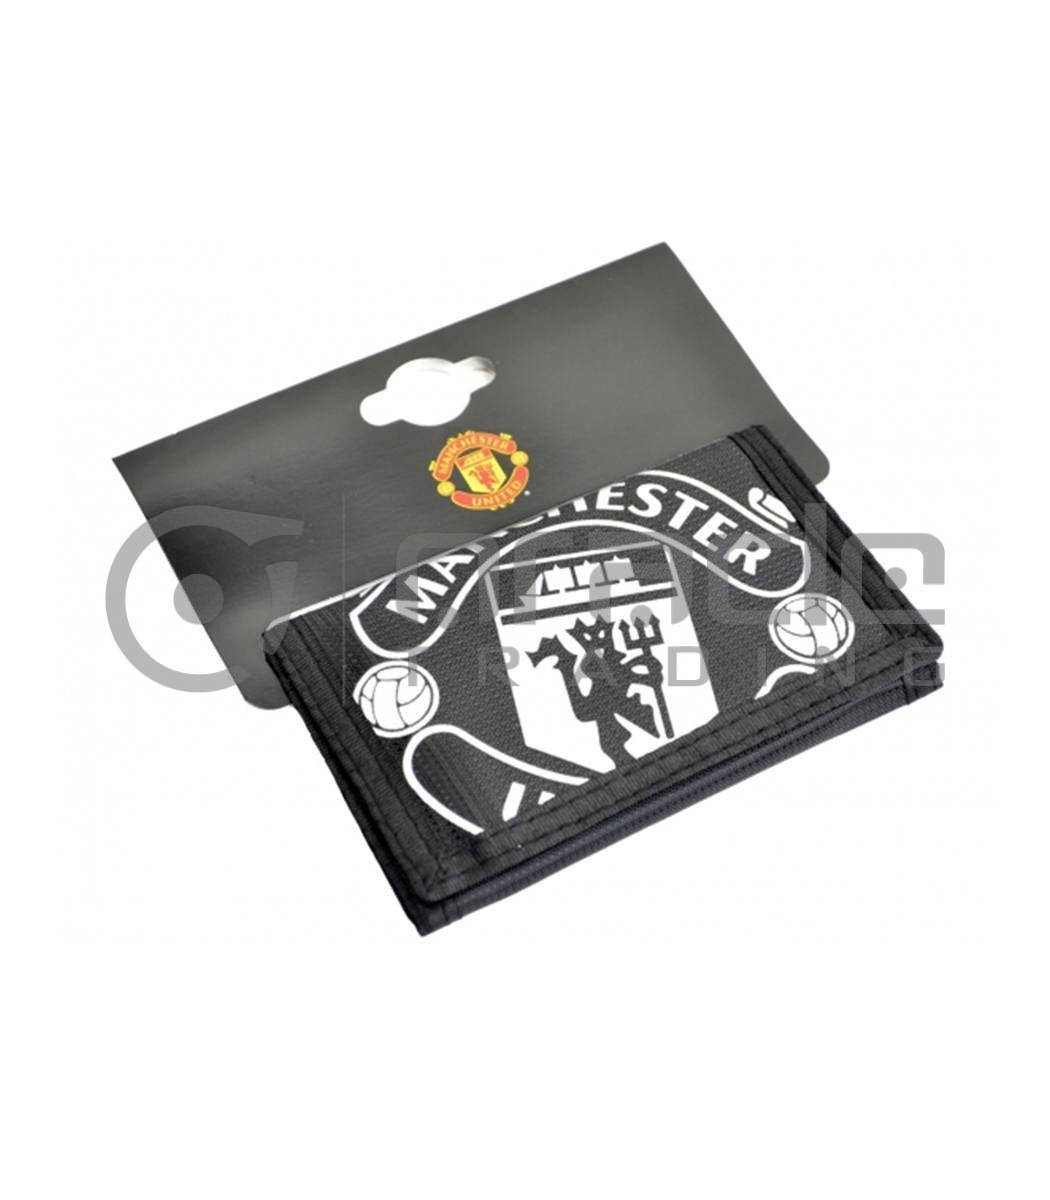 Manchester United Black Wallet